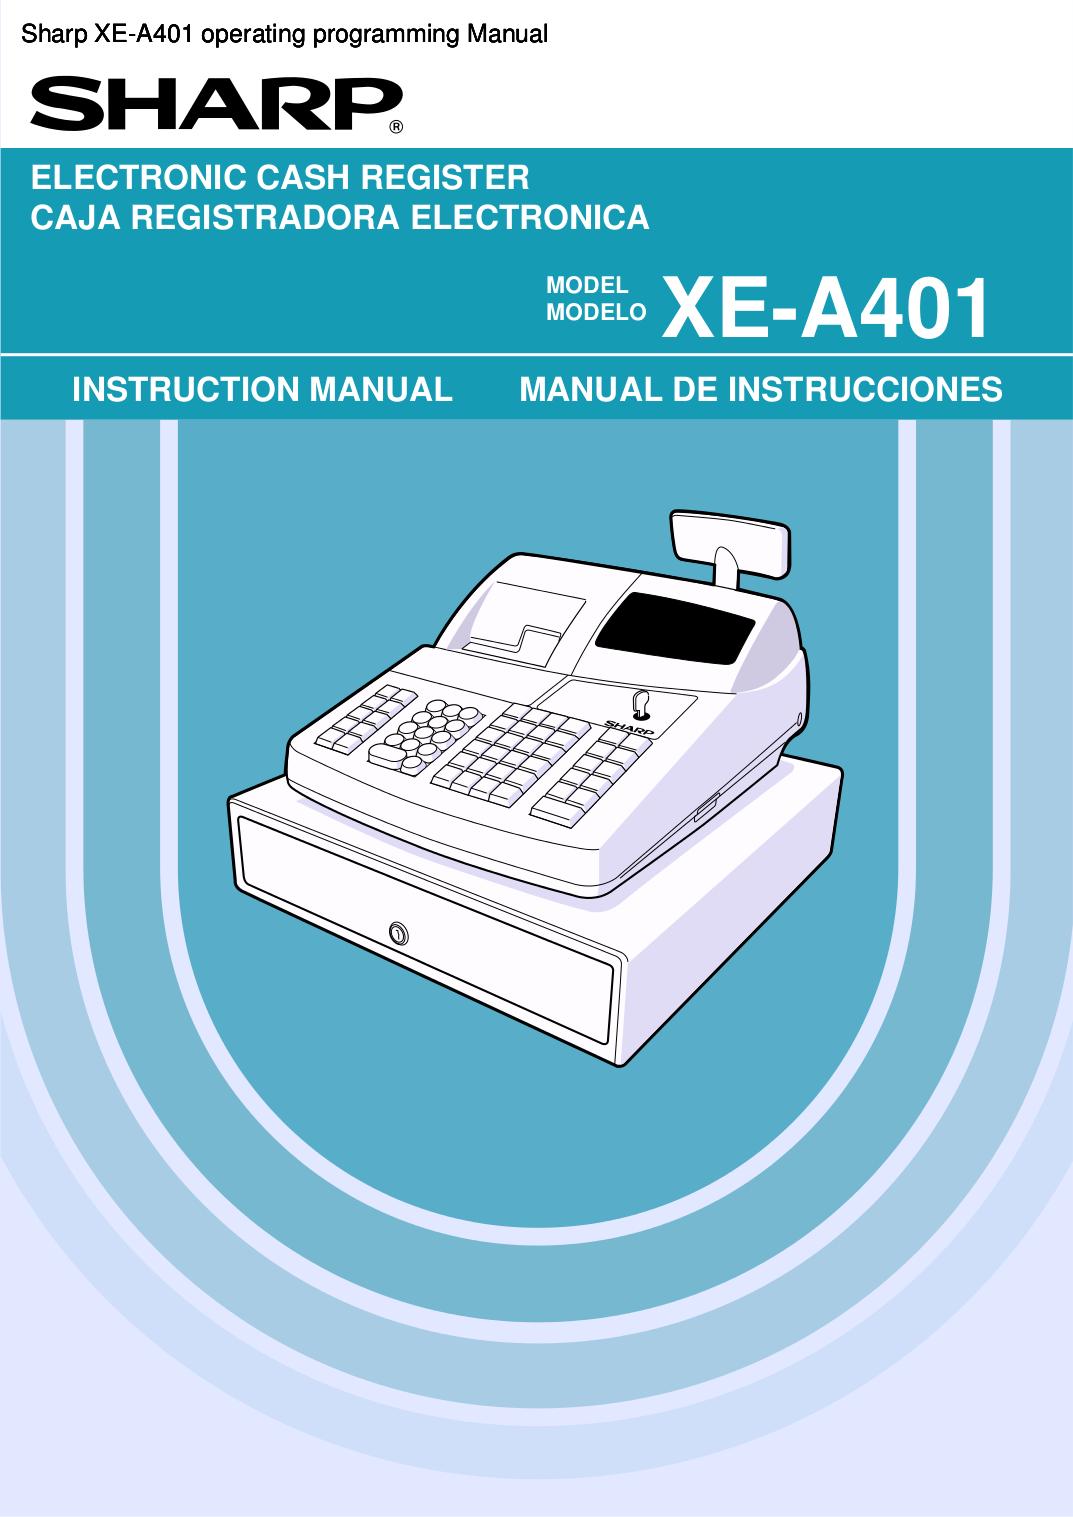 Sharp xe-a401 thermal digital cash register | ebay.